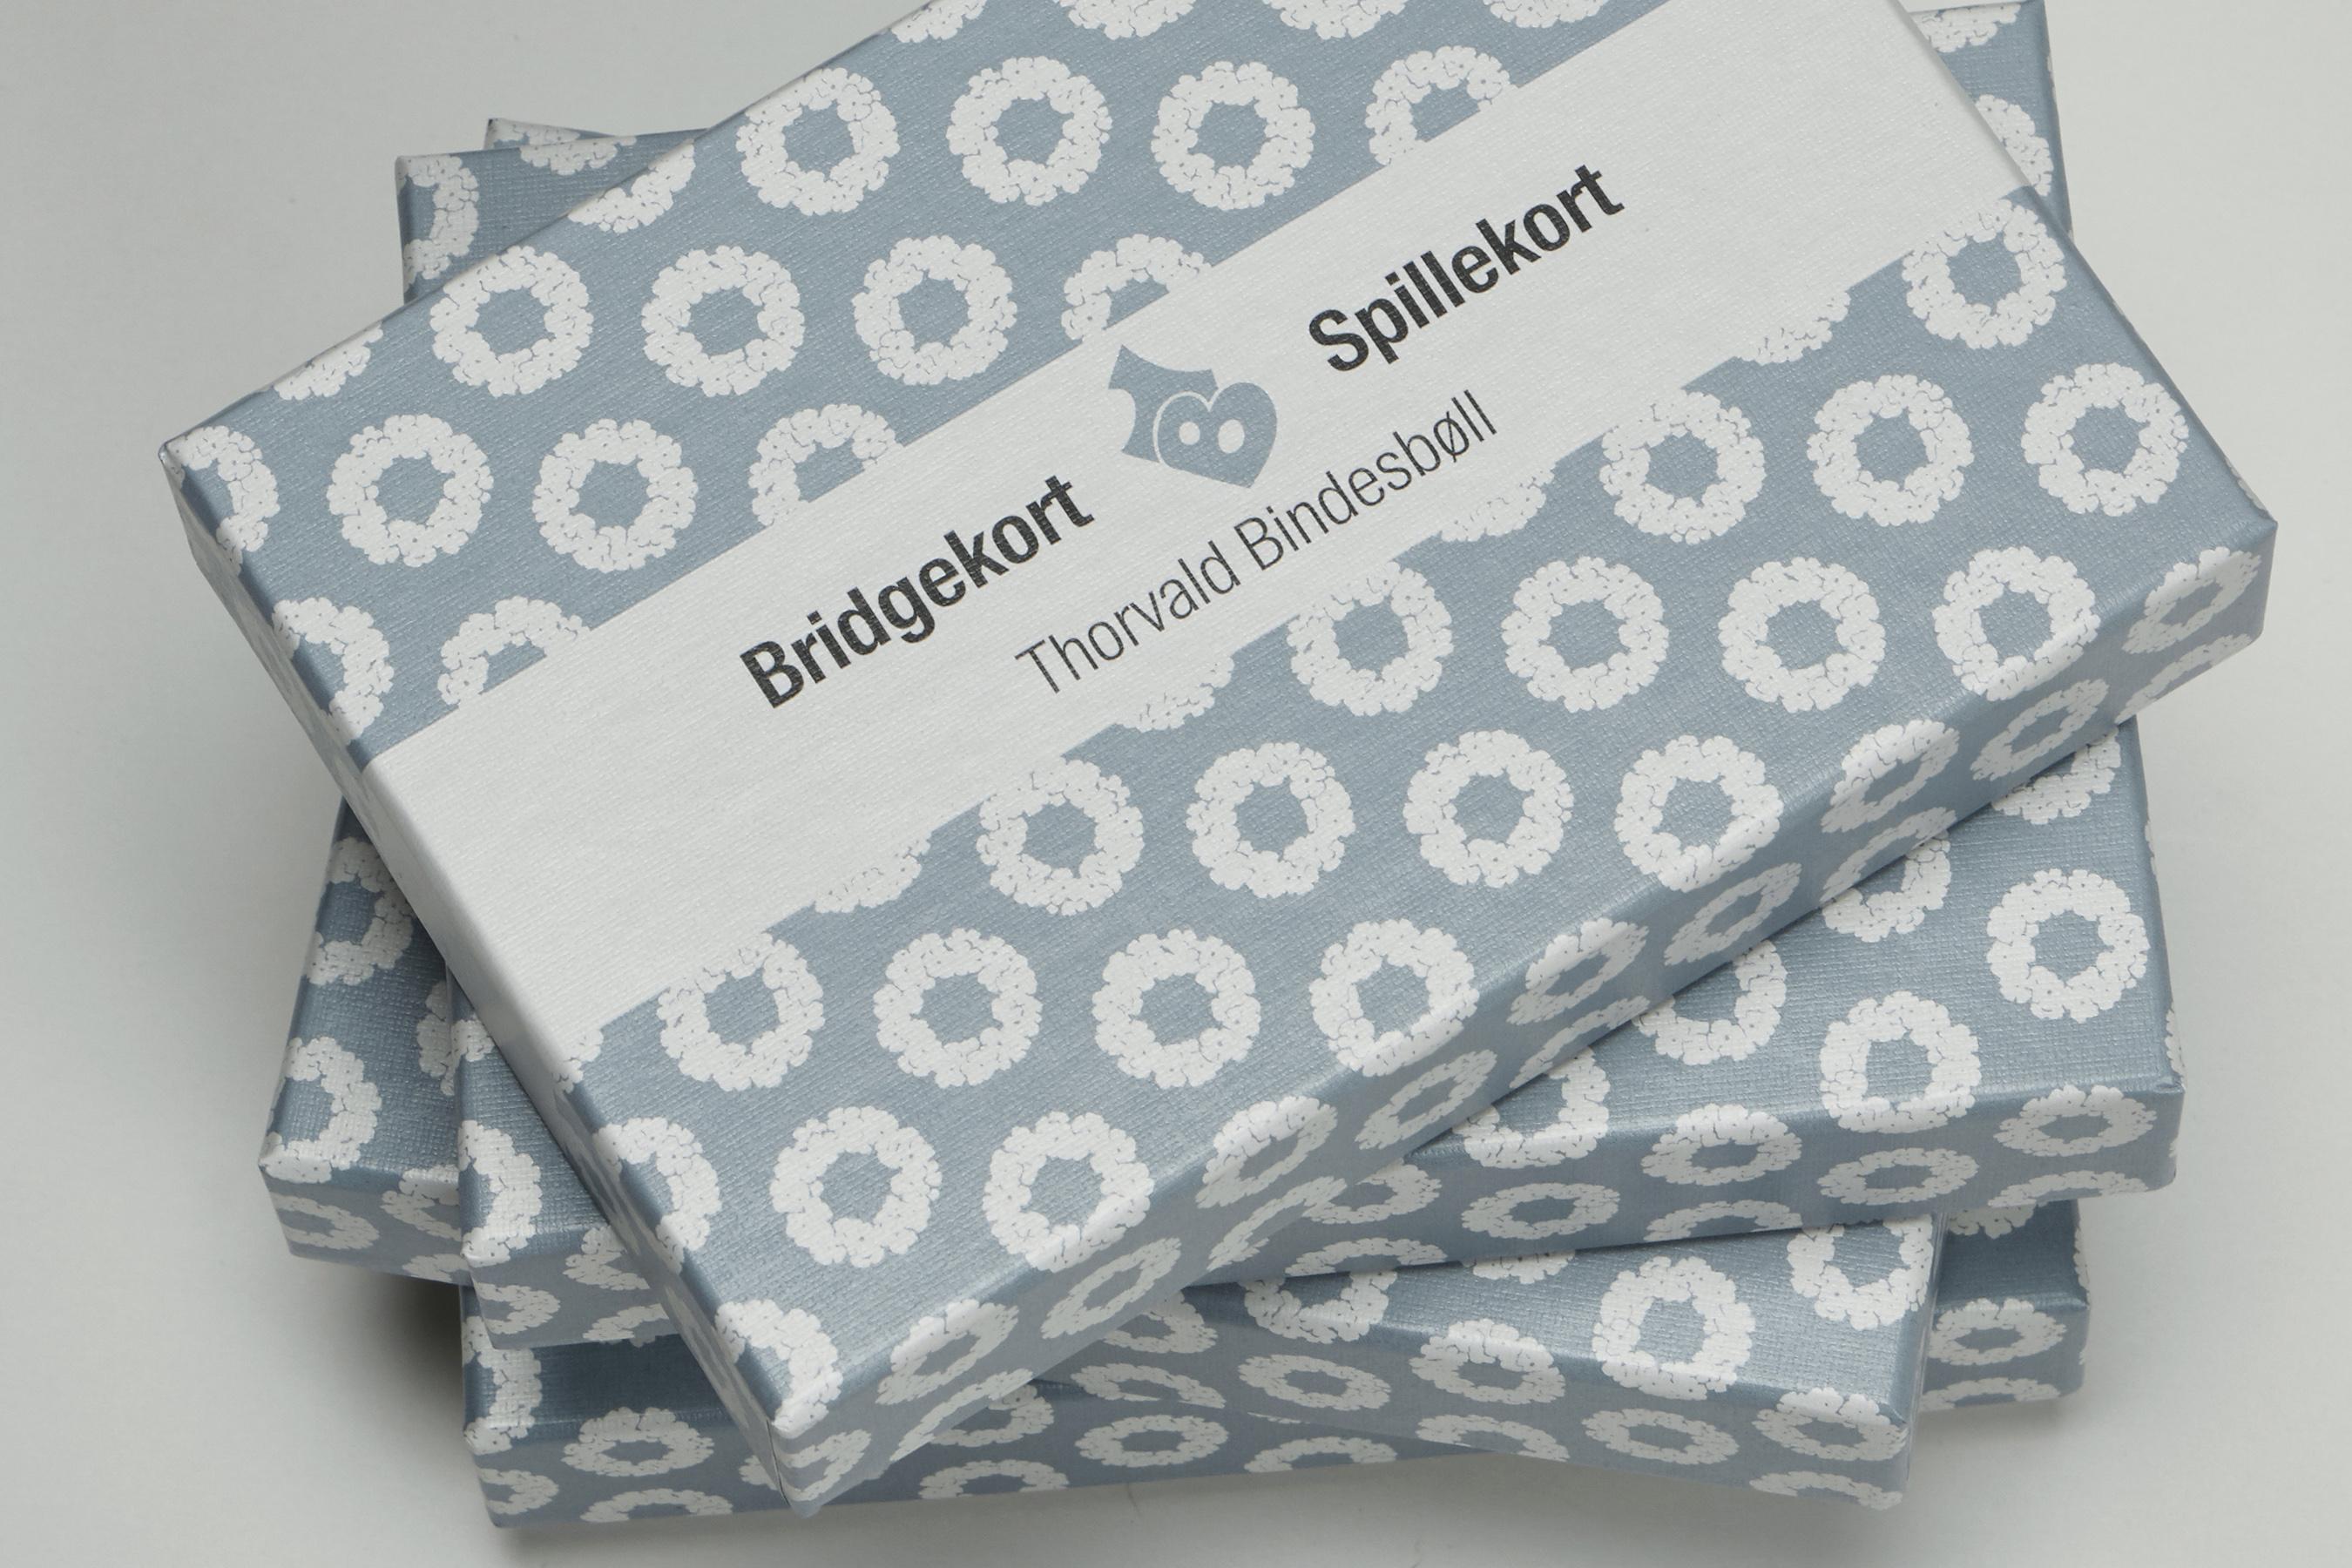 Bridgekort med Bindesbøll-motiv (blå)